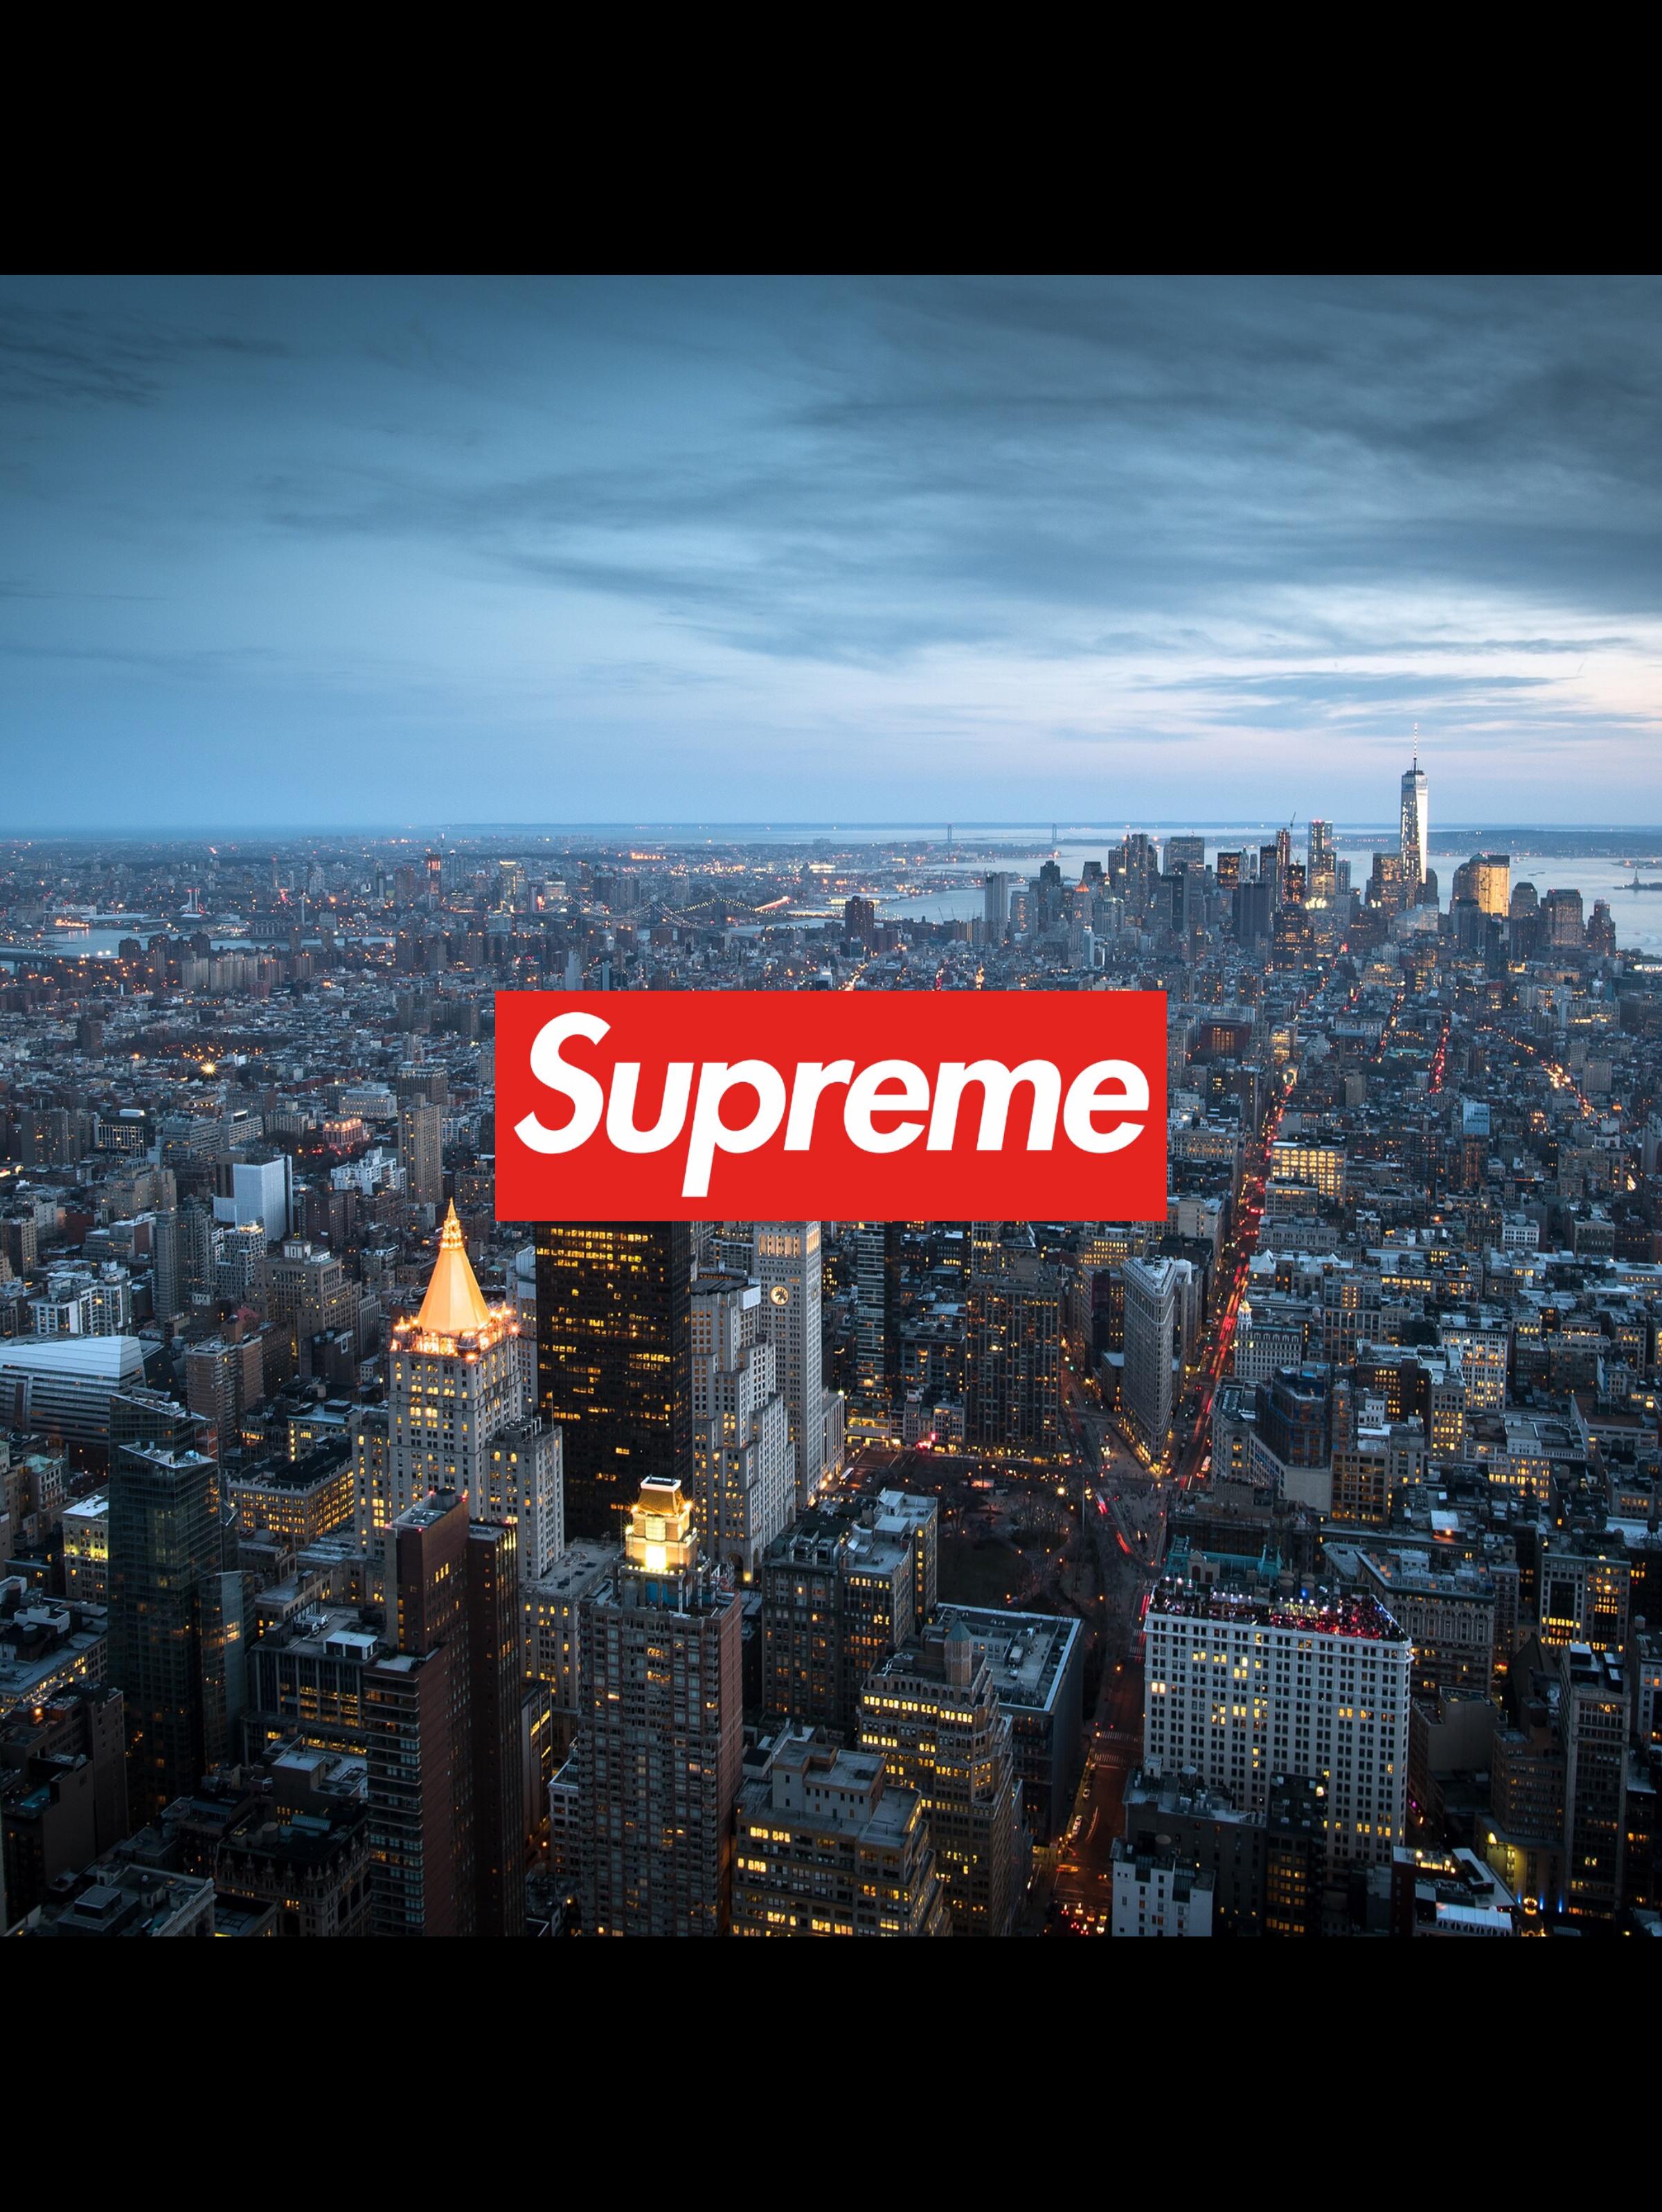 Fon D Ecran Supreme Iphone Wallpaper Supreme Wallpaper